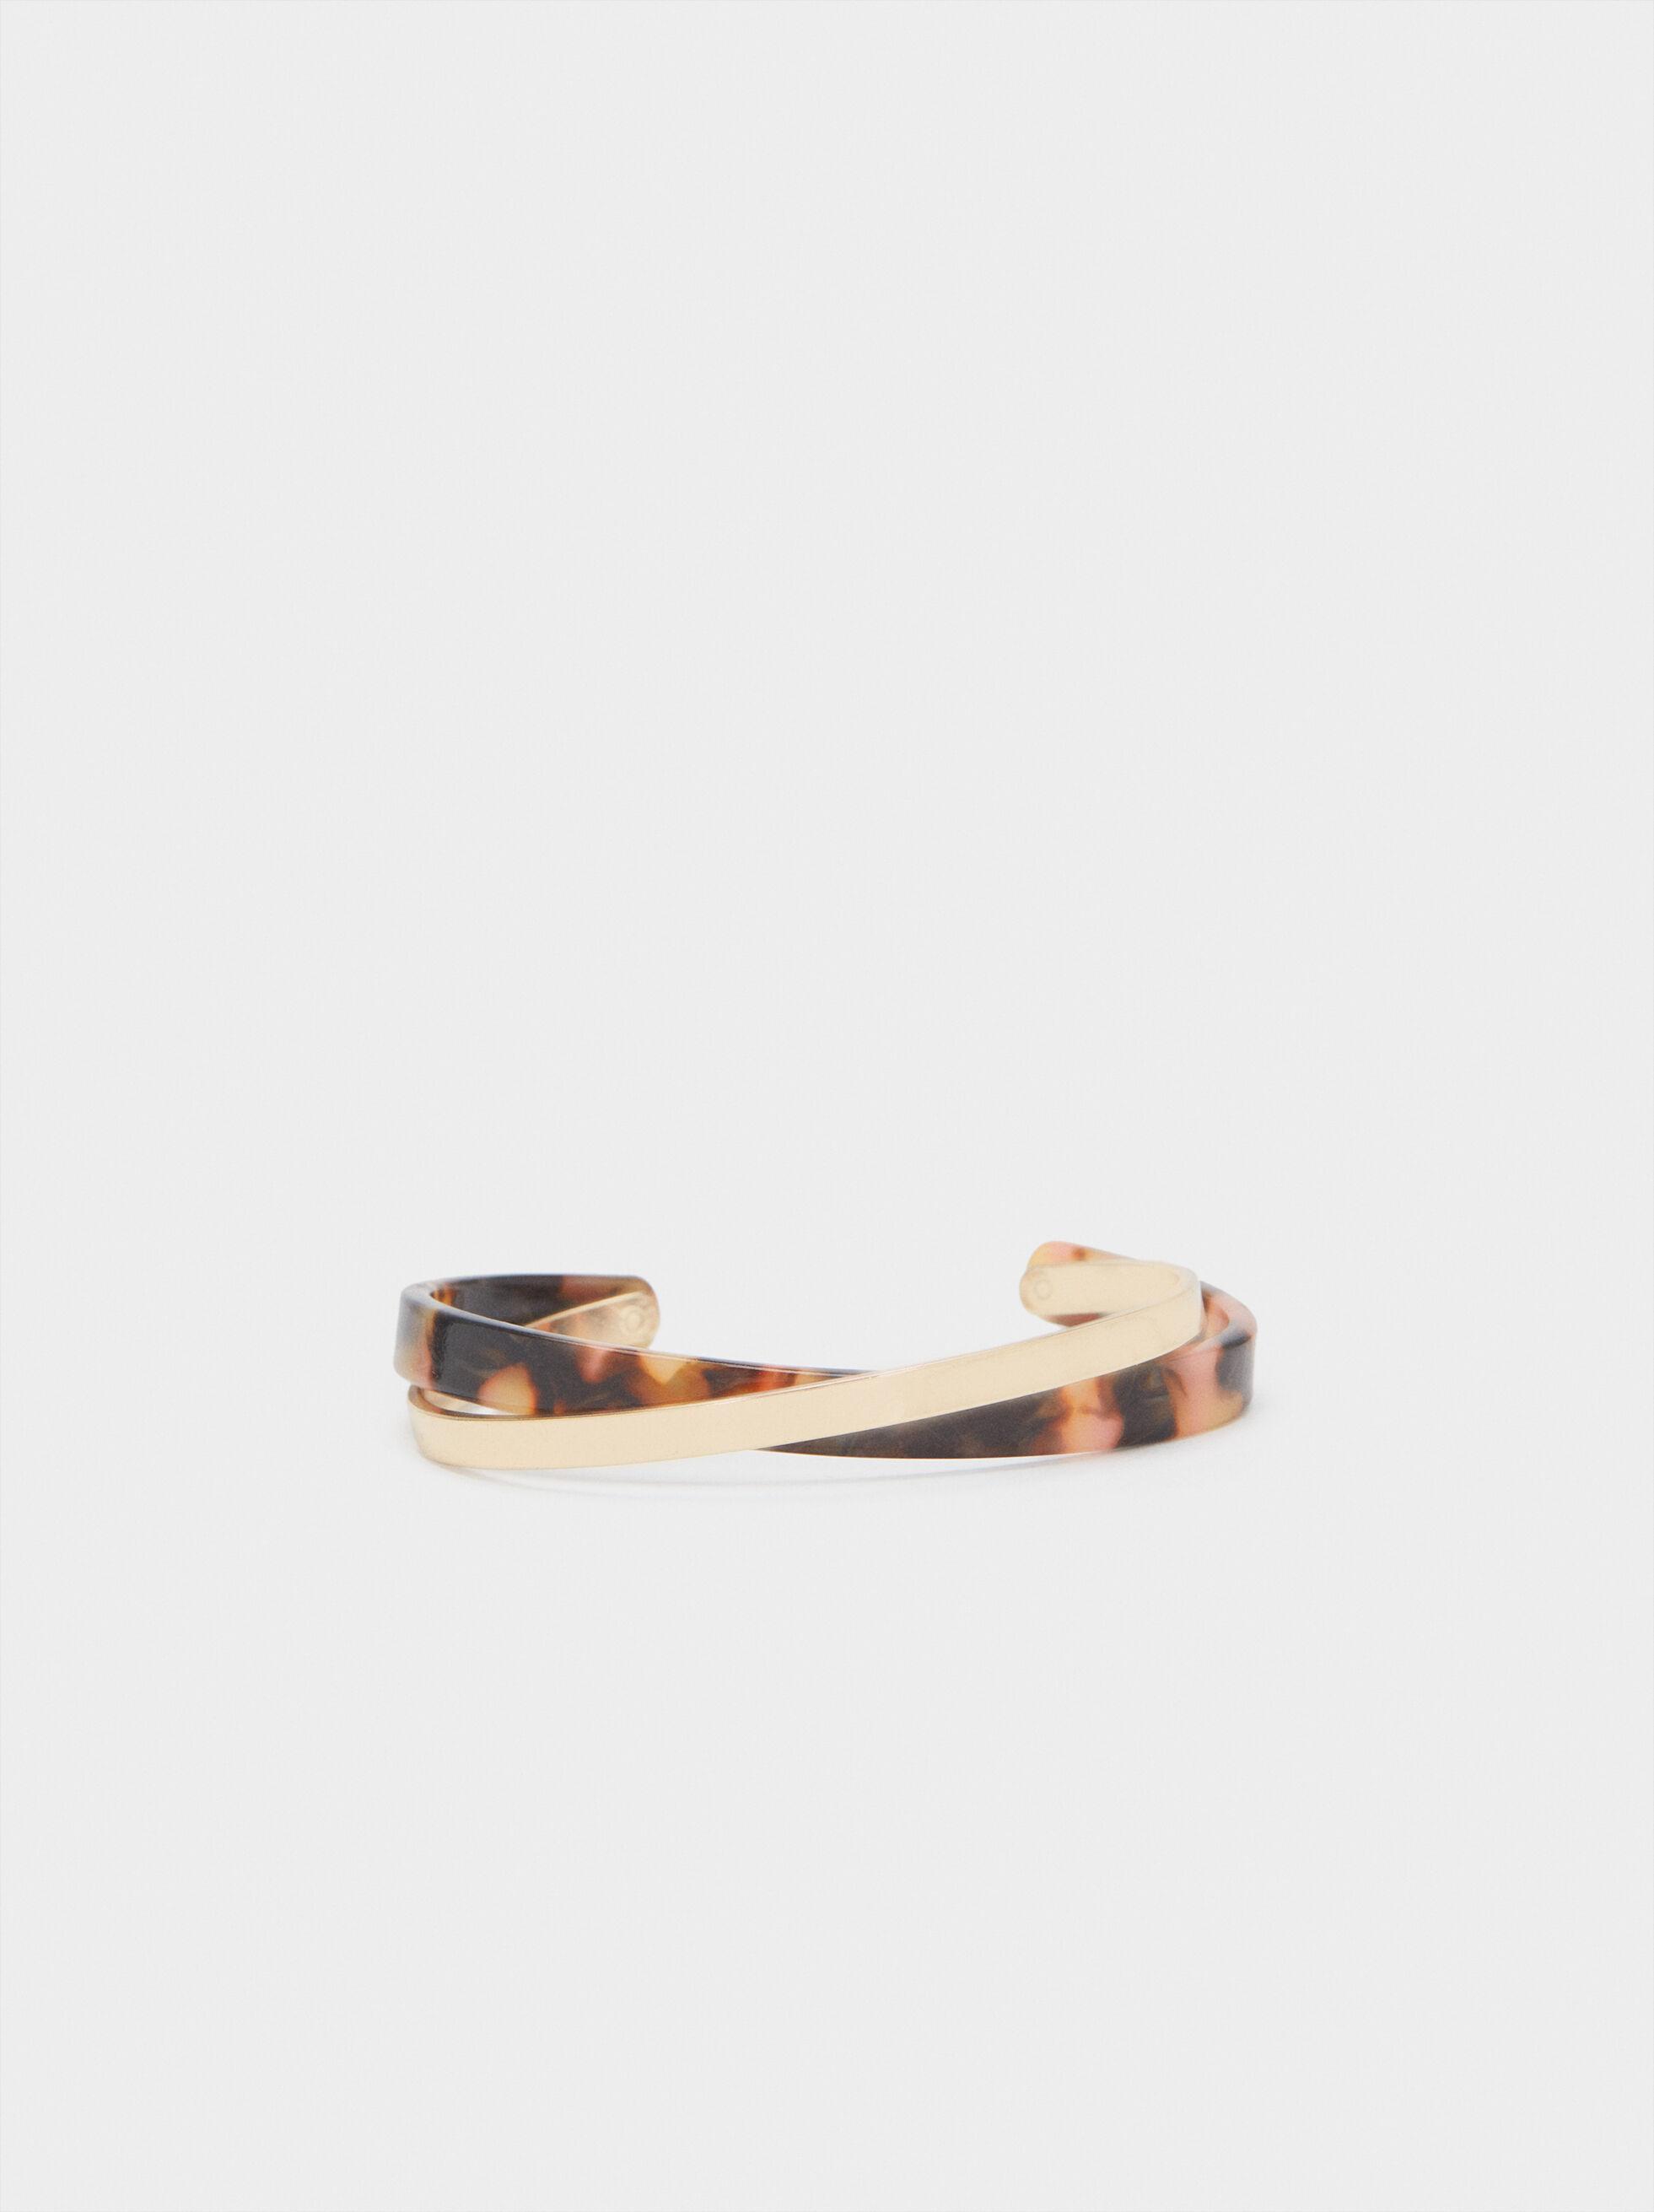 Multicoloured Double Cuff Bracelet, Multicolor, hi-res